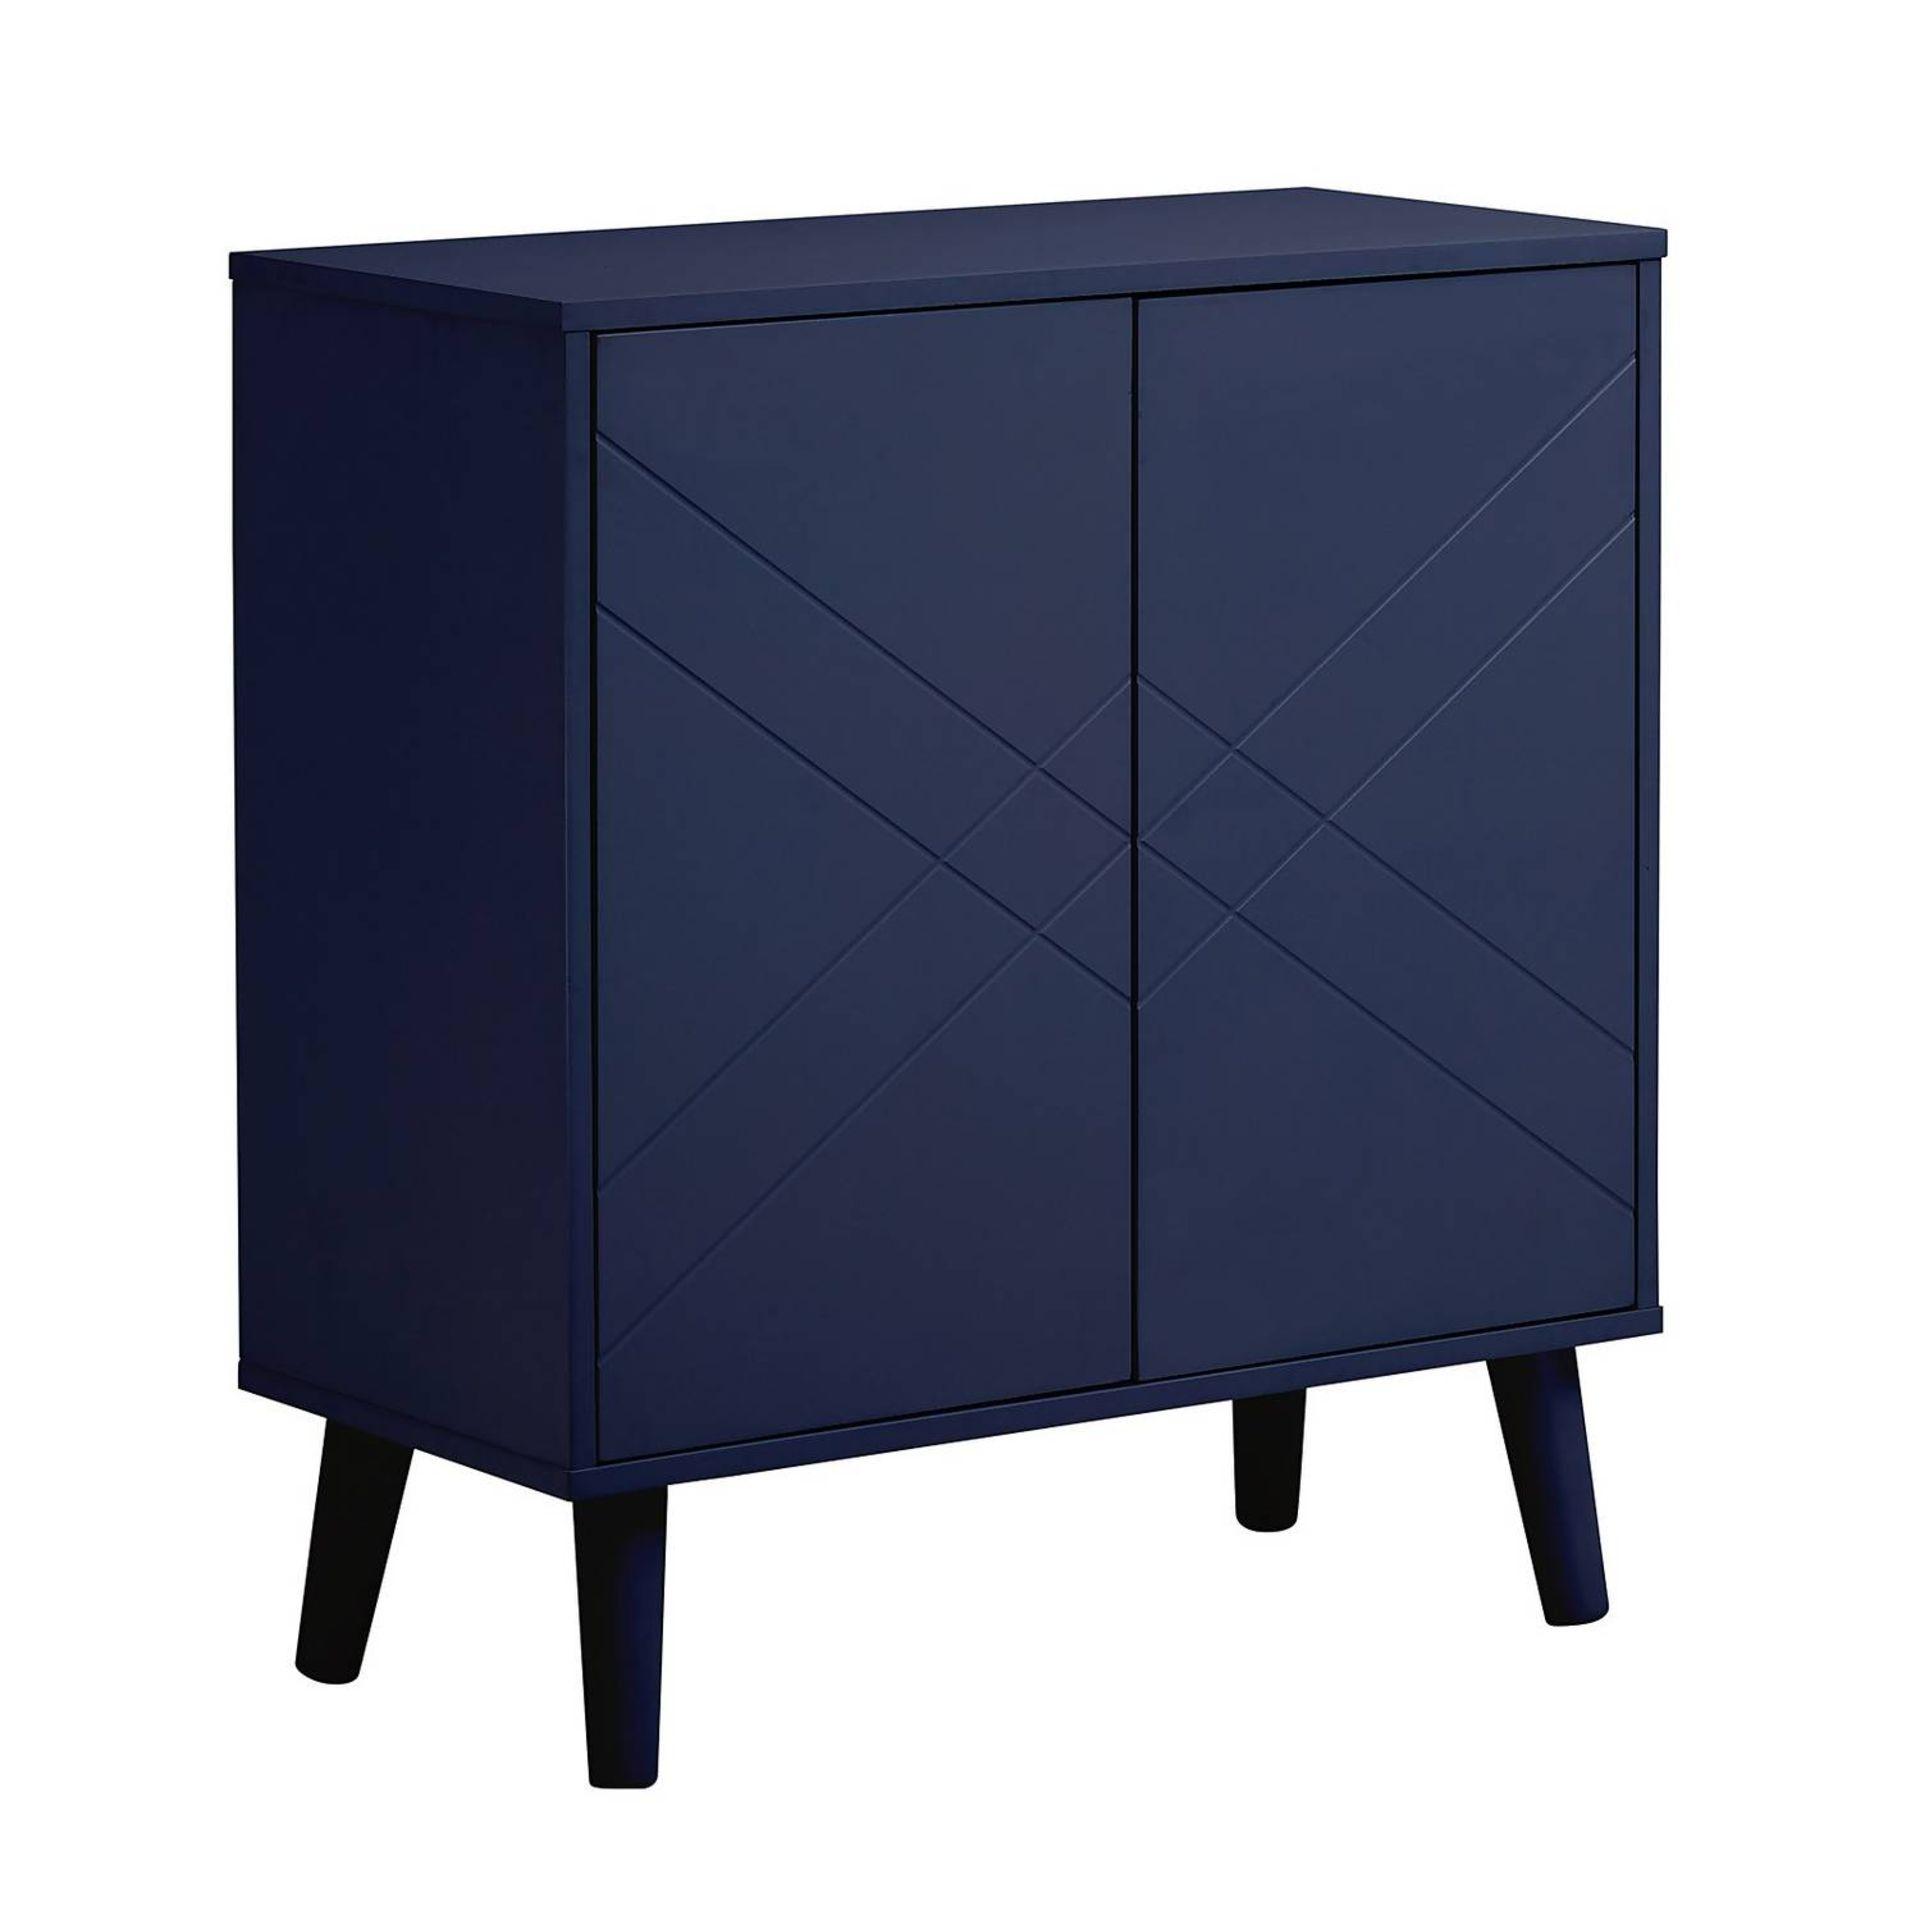 (2K) 4x Items. 1x Hamilton Shoe Cabinet Charcoal. 1x Hamilton Hallway Cabinet Navy (H76x W70x D32.5 - Image 2 of 8